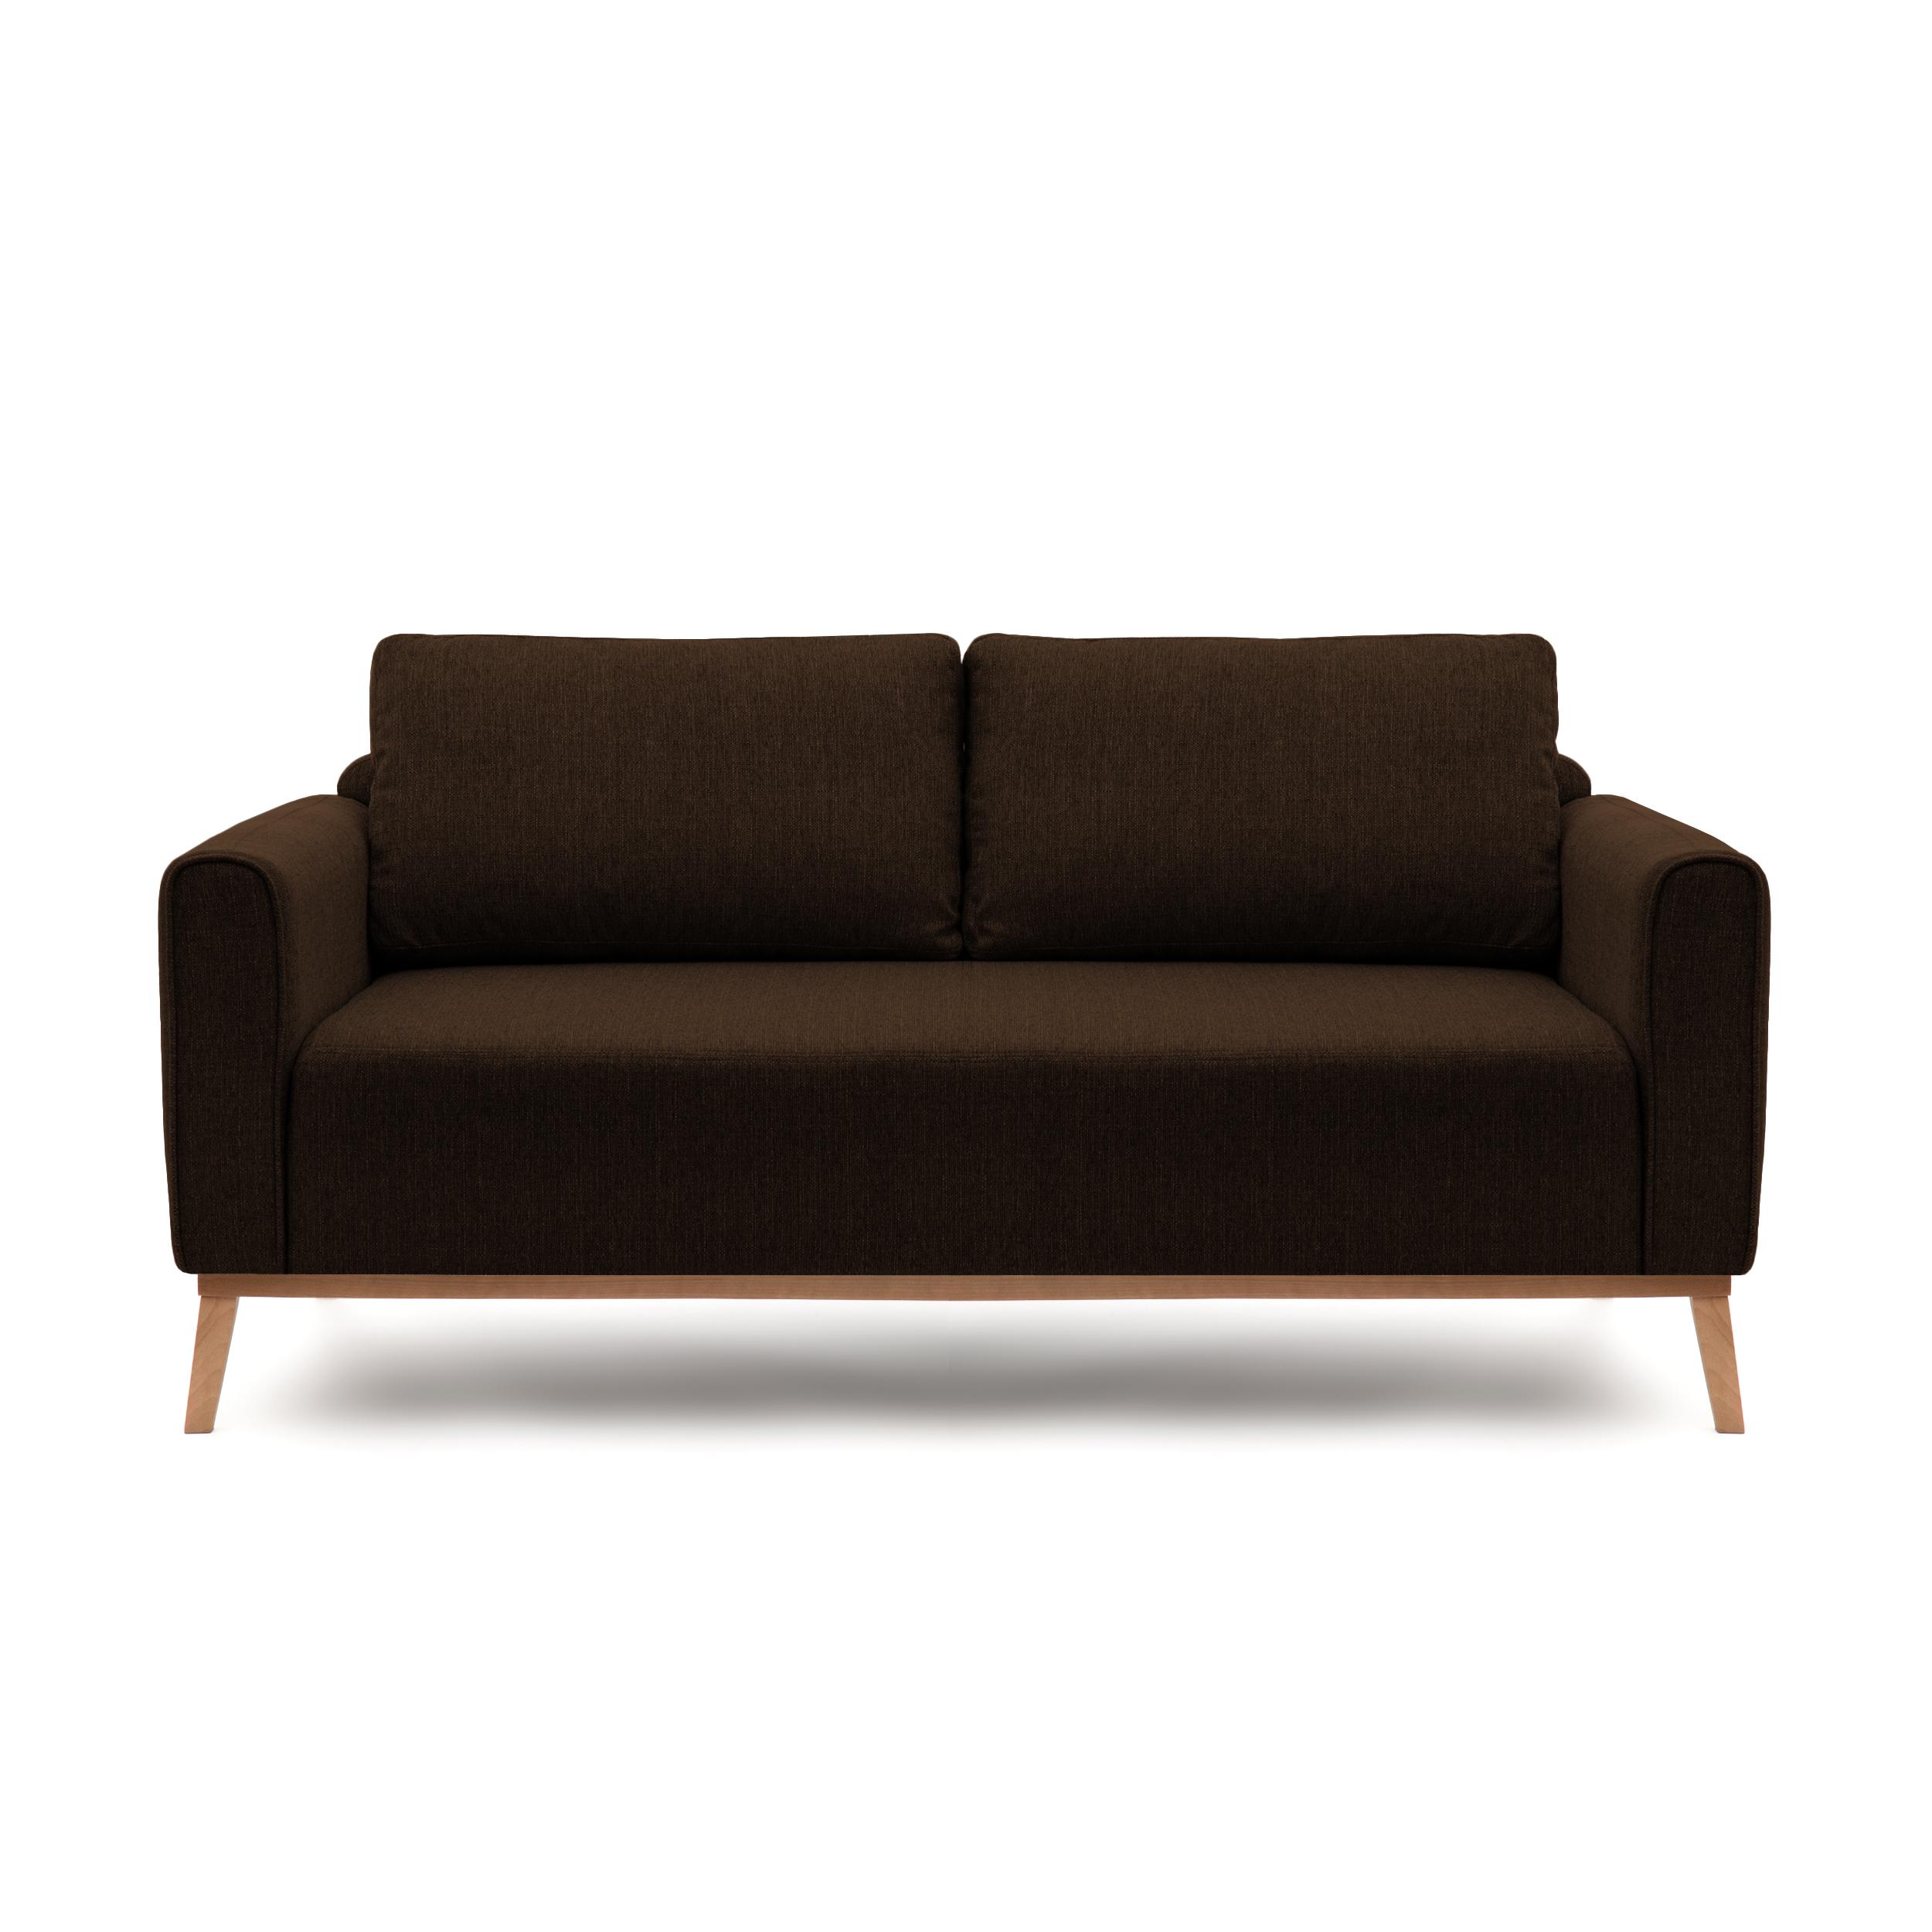 Canapea Fixa 3 locuri Milton Dark Brown